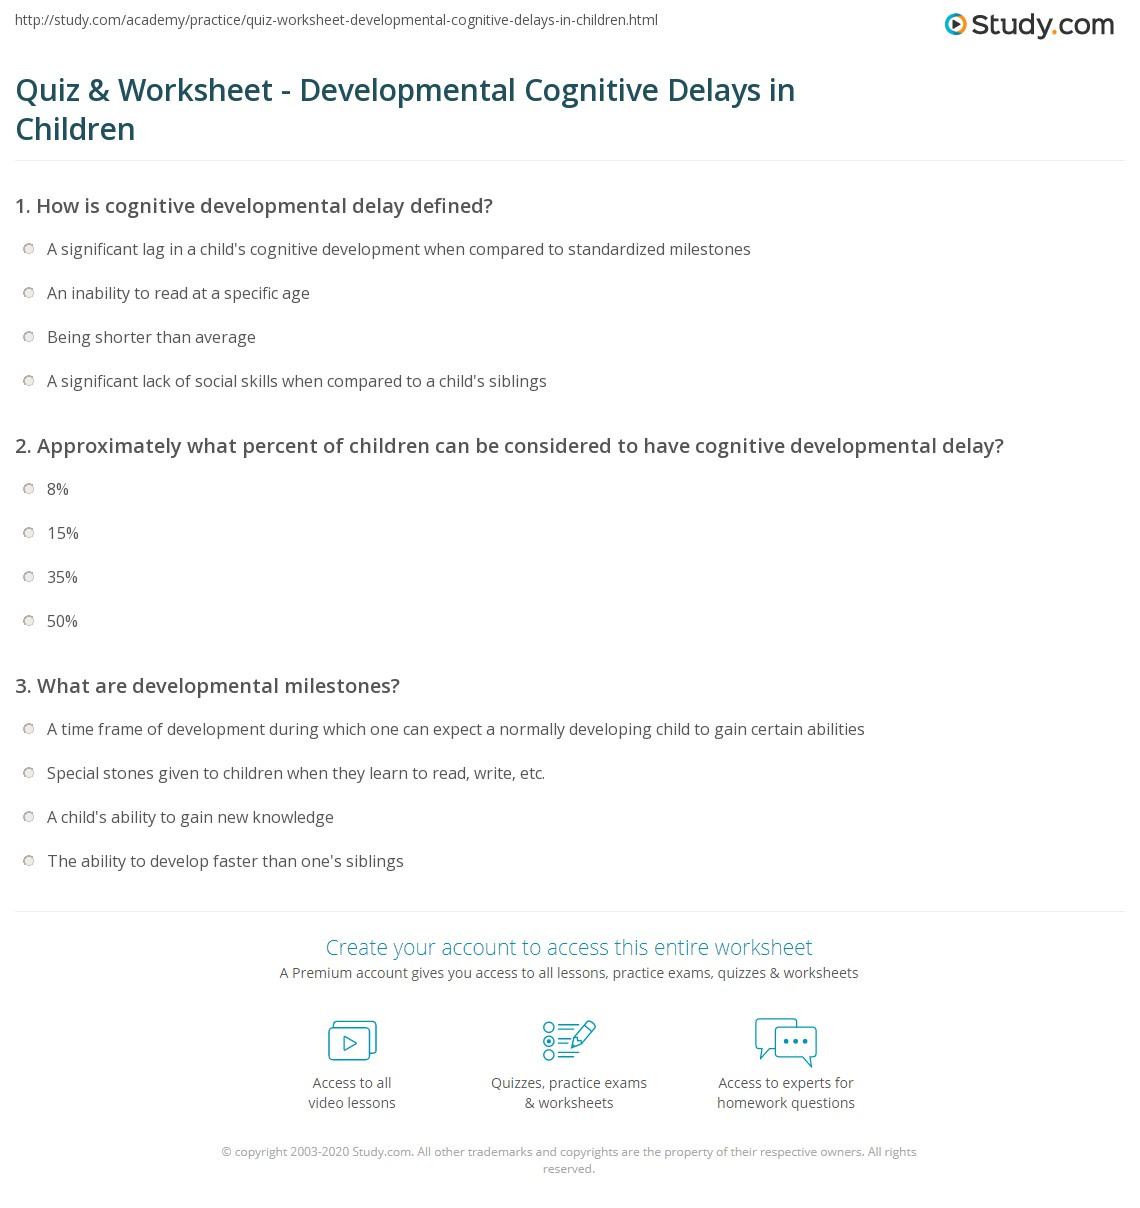 quiz & worksheet - developmental cognitive delays in children